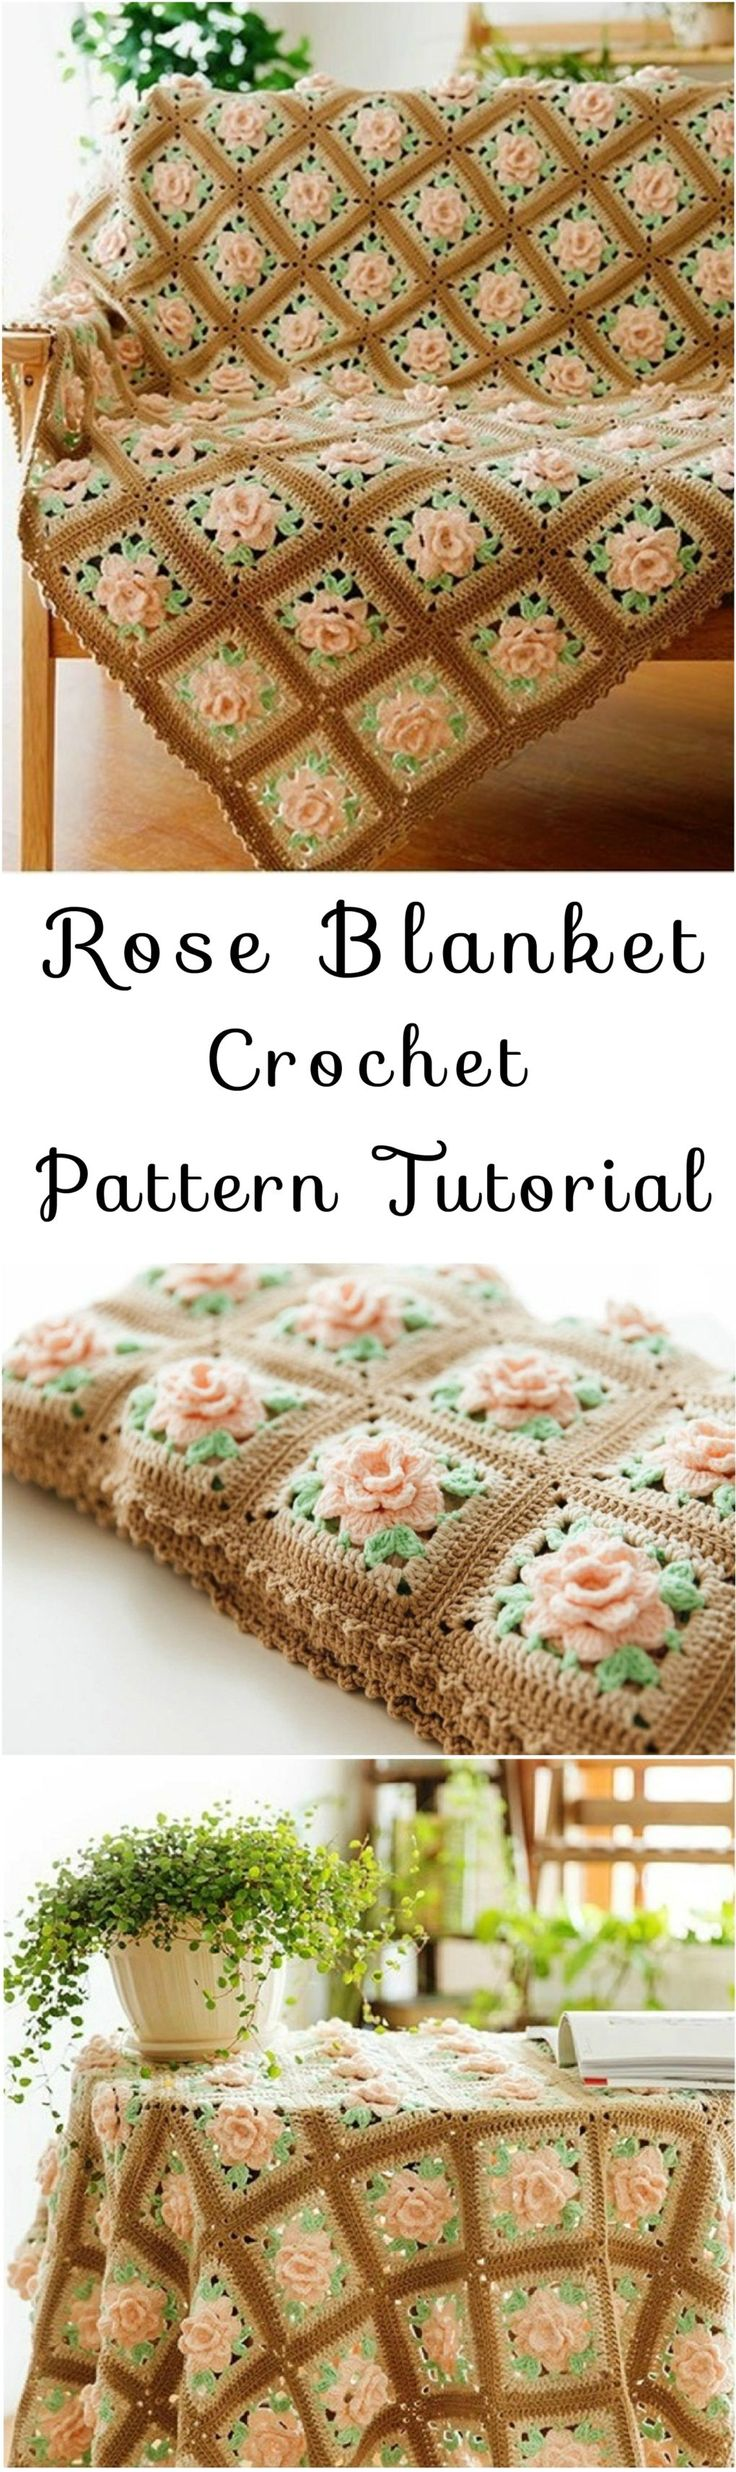 Rose Blanket Crochet Pattern Tutorial